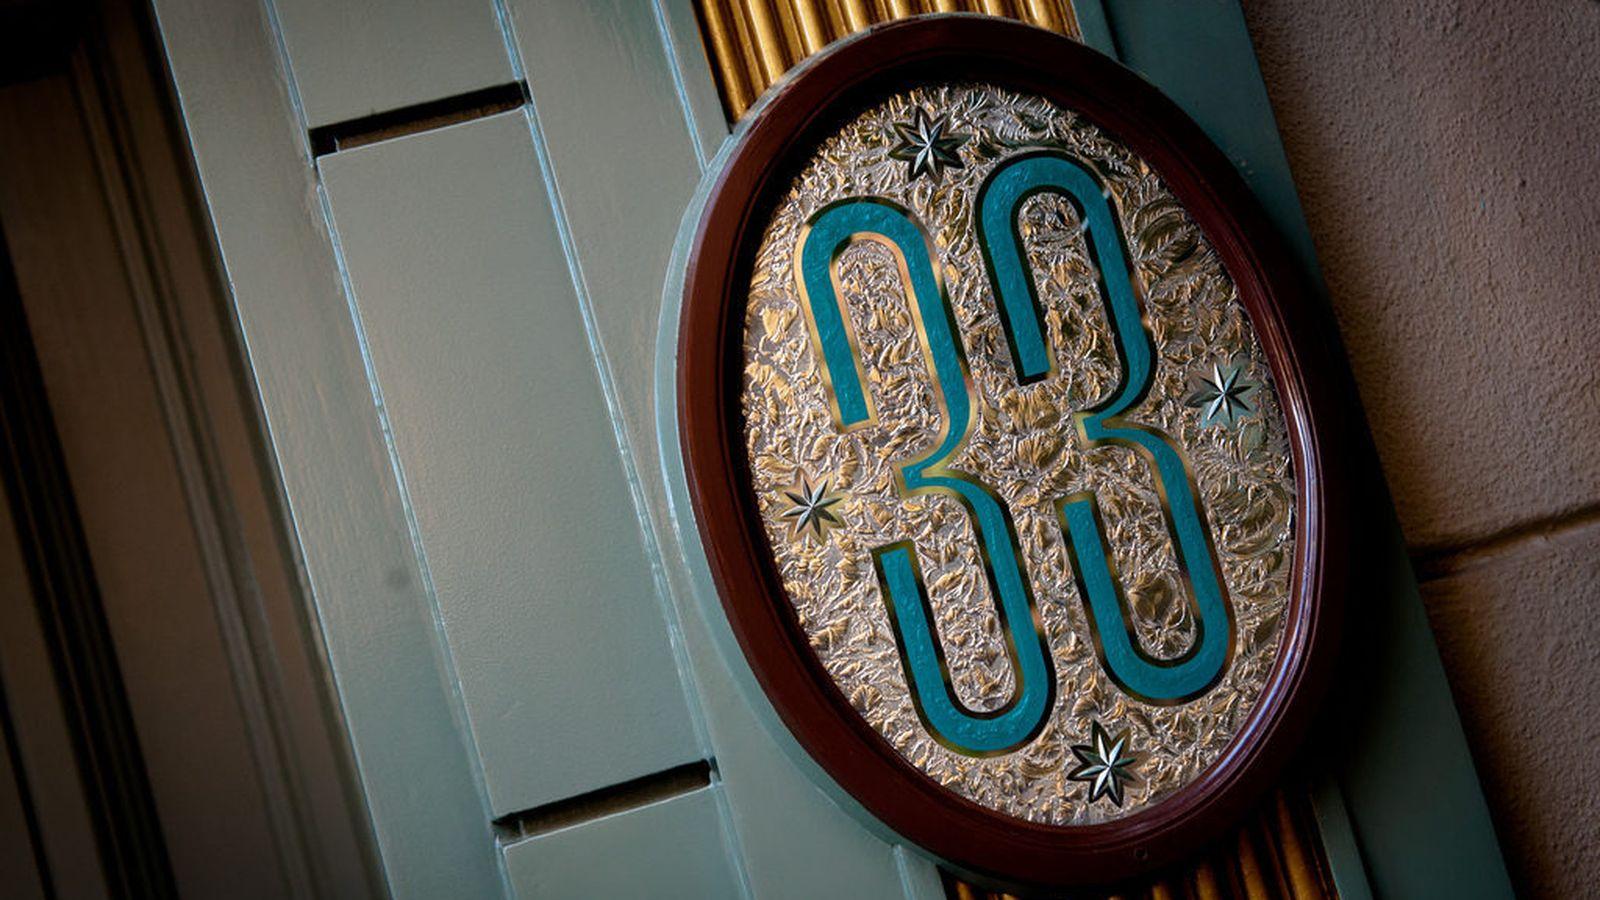 10 datos curiosos que no conocías sobre Disneyland